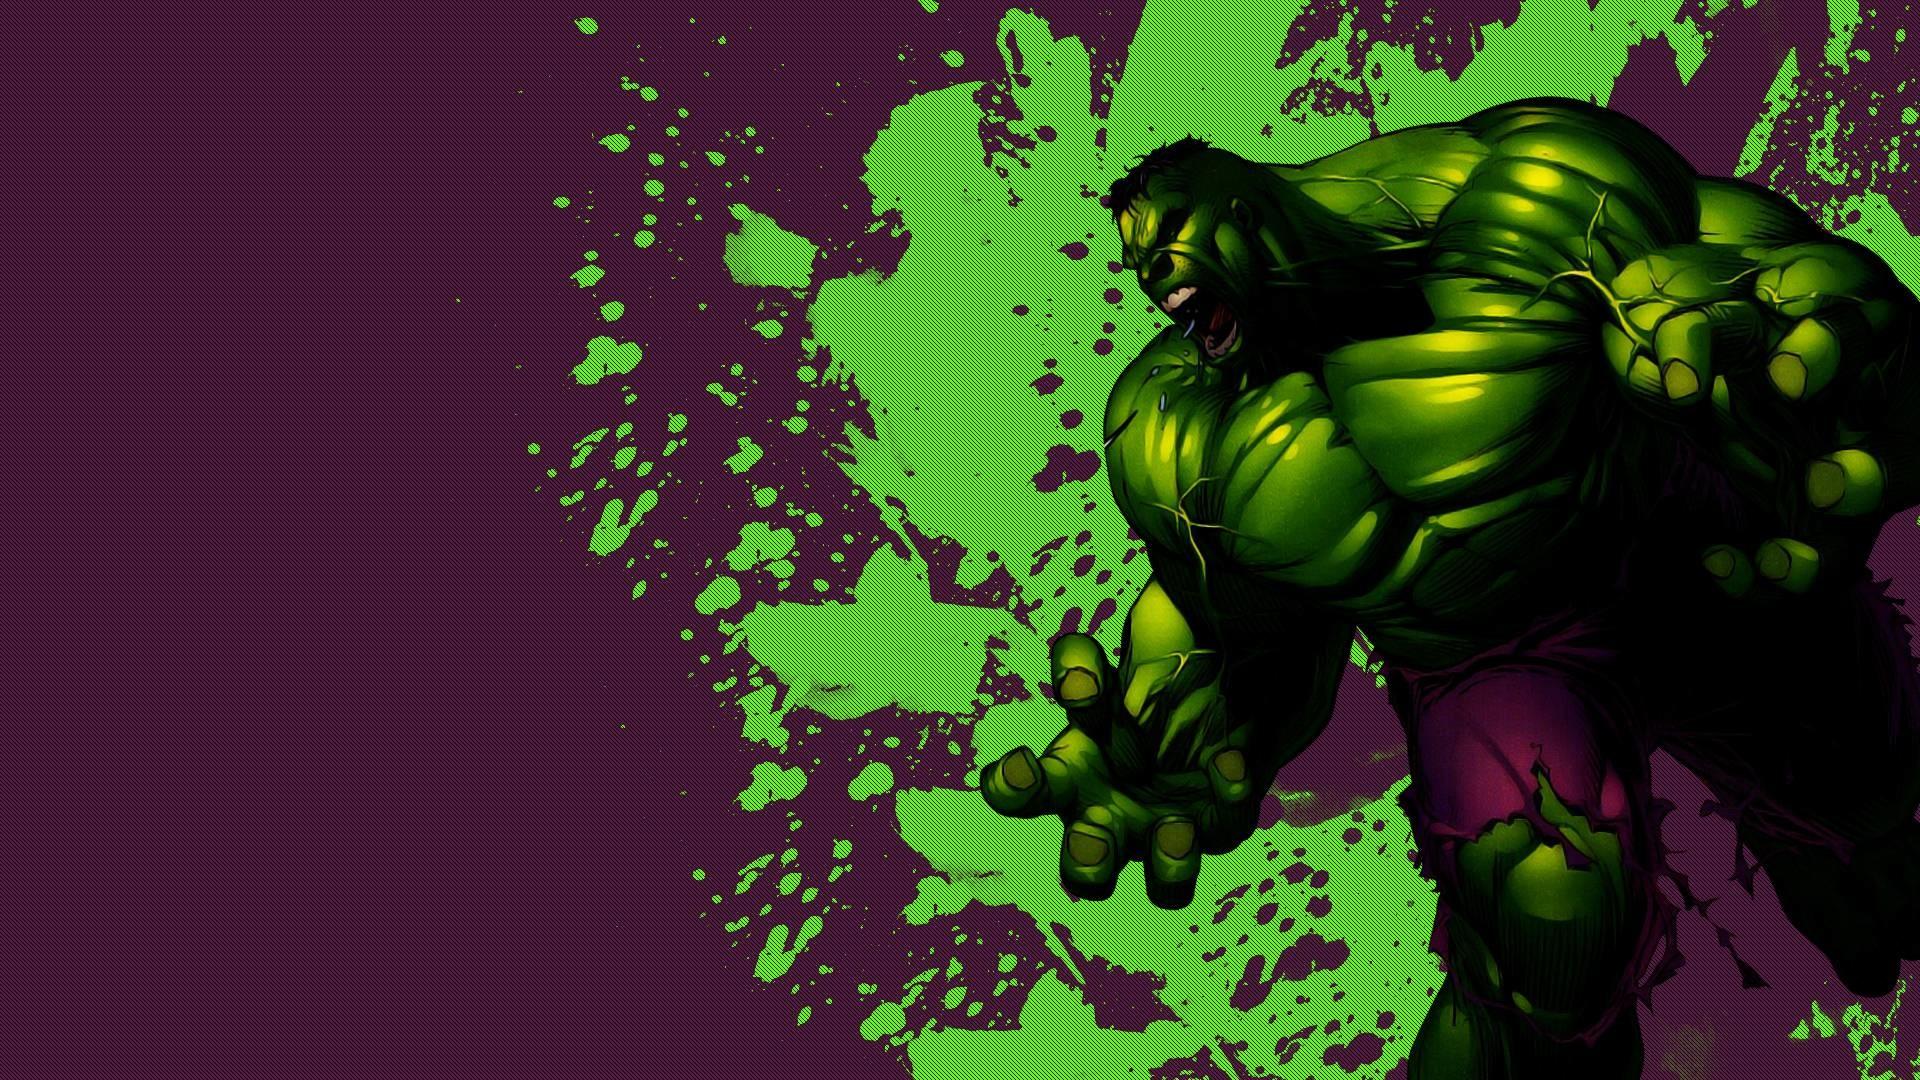 The Hulk Wallpaper 64 Images